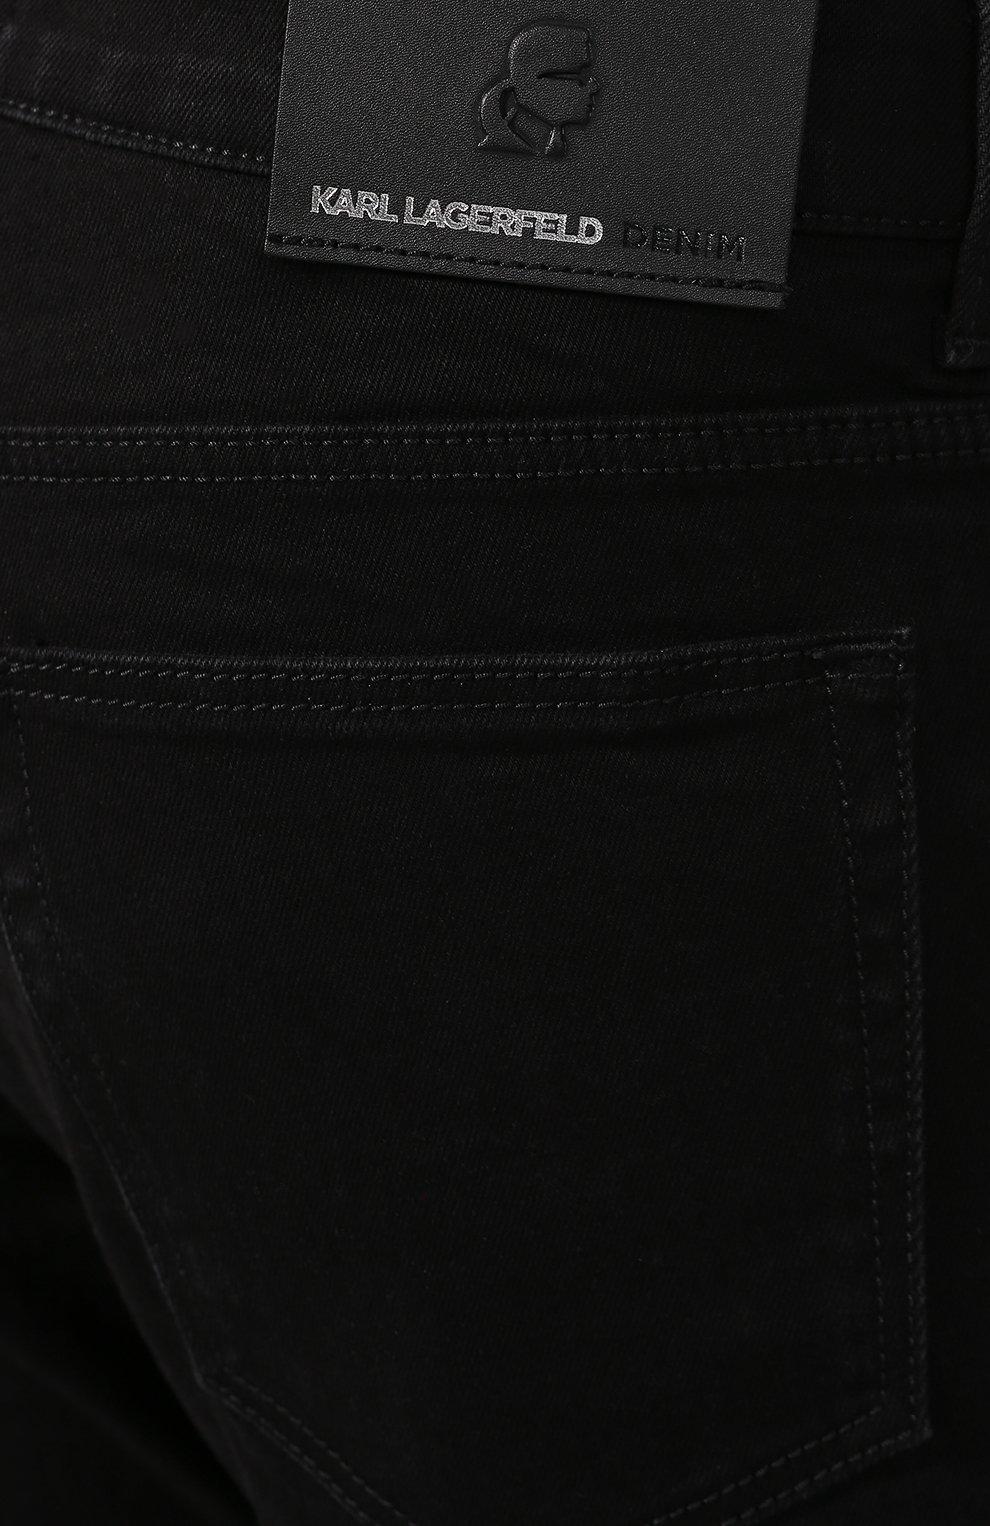 Джинсы Karl Lagerfeld denim черные | Фото №5